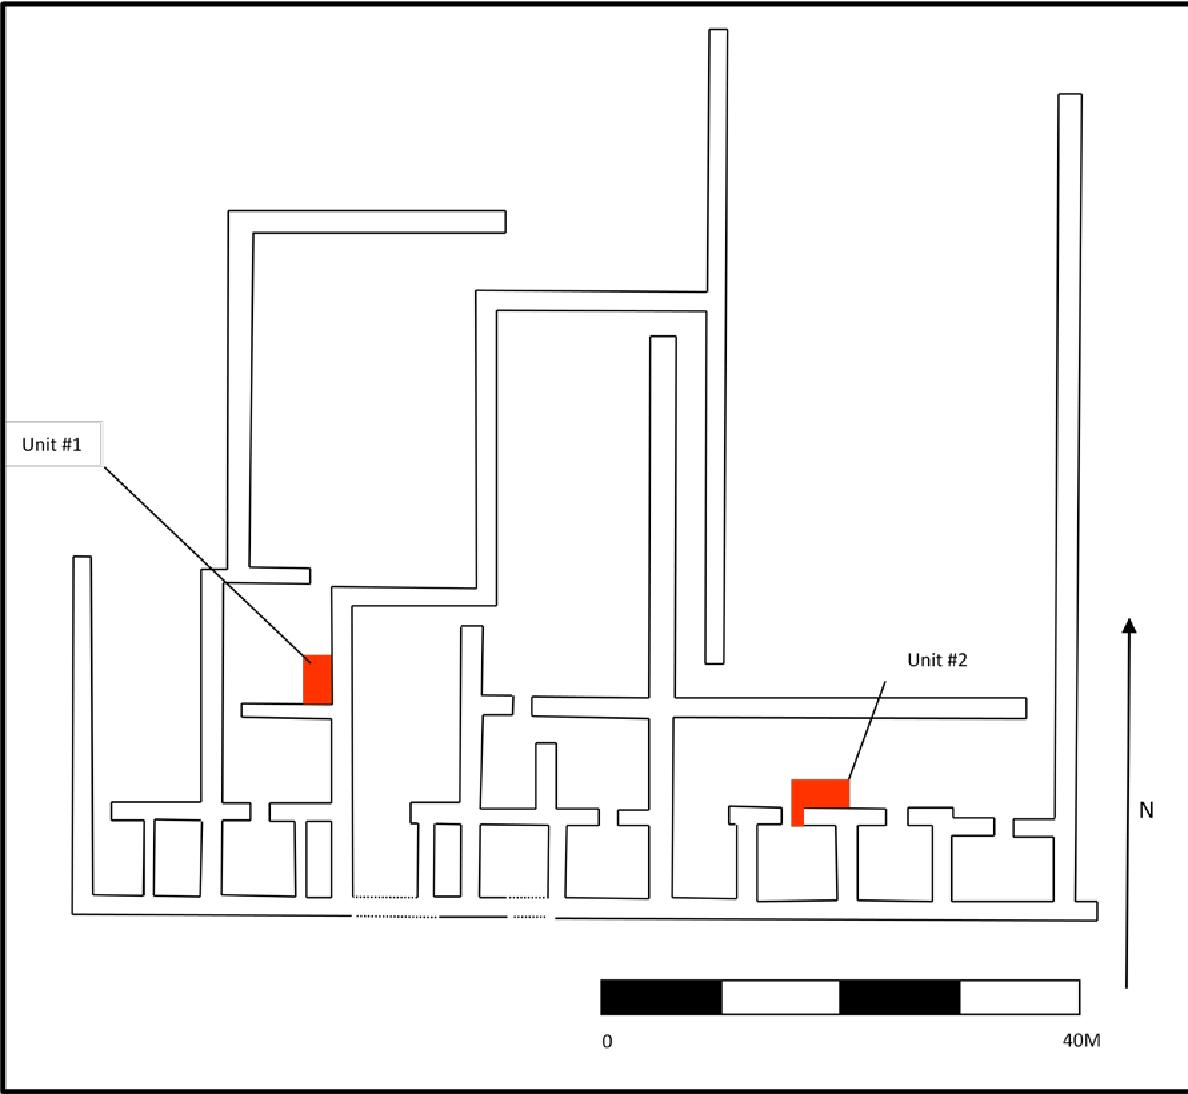 figure 5.31